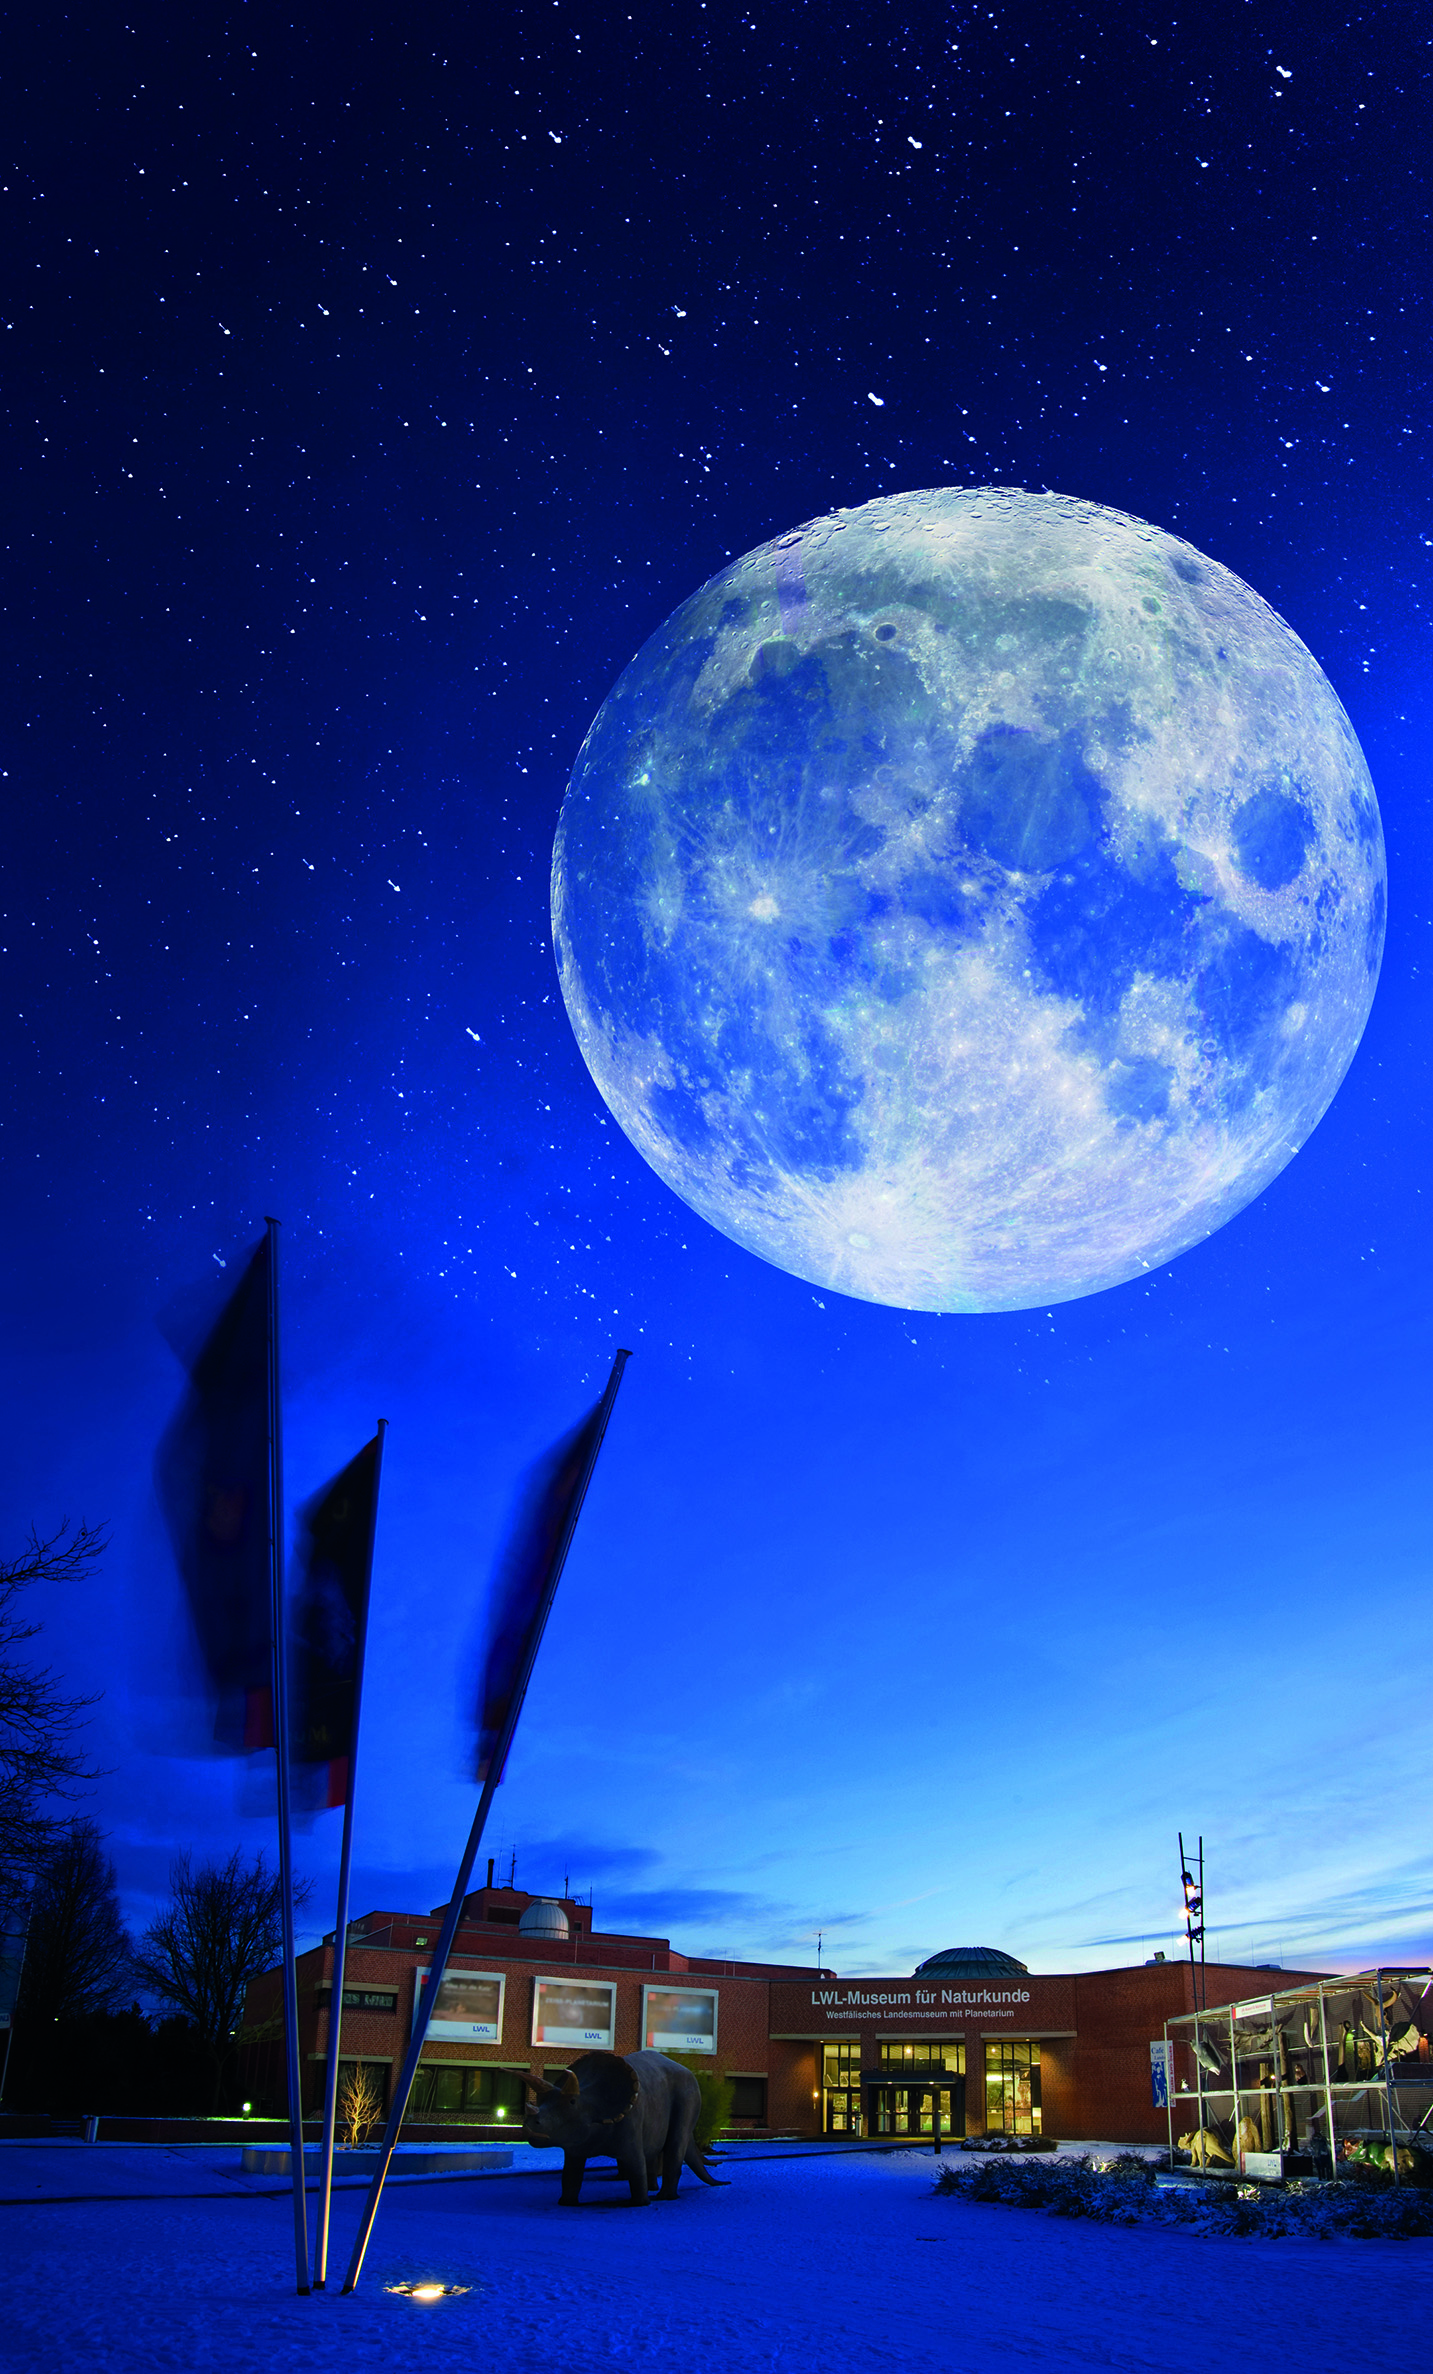 Bilddatei: Museum+Mond+Sterne-kl(C)LWL,Oblonczyk+NASA.jpg